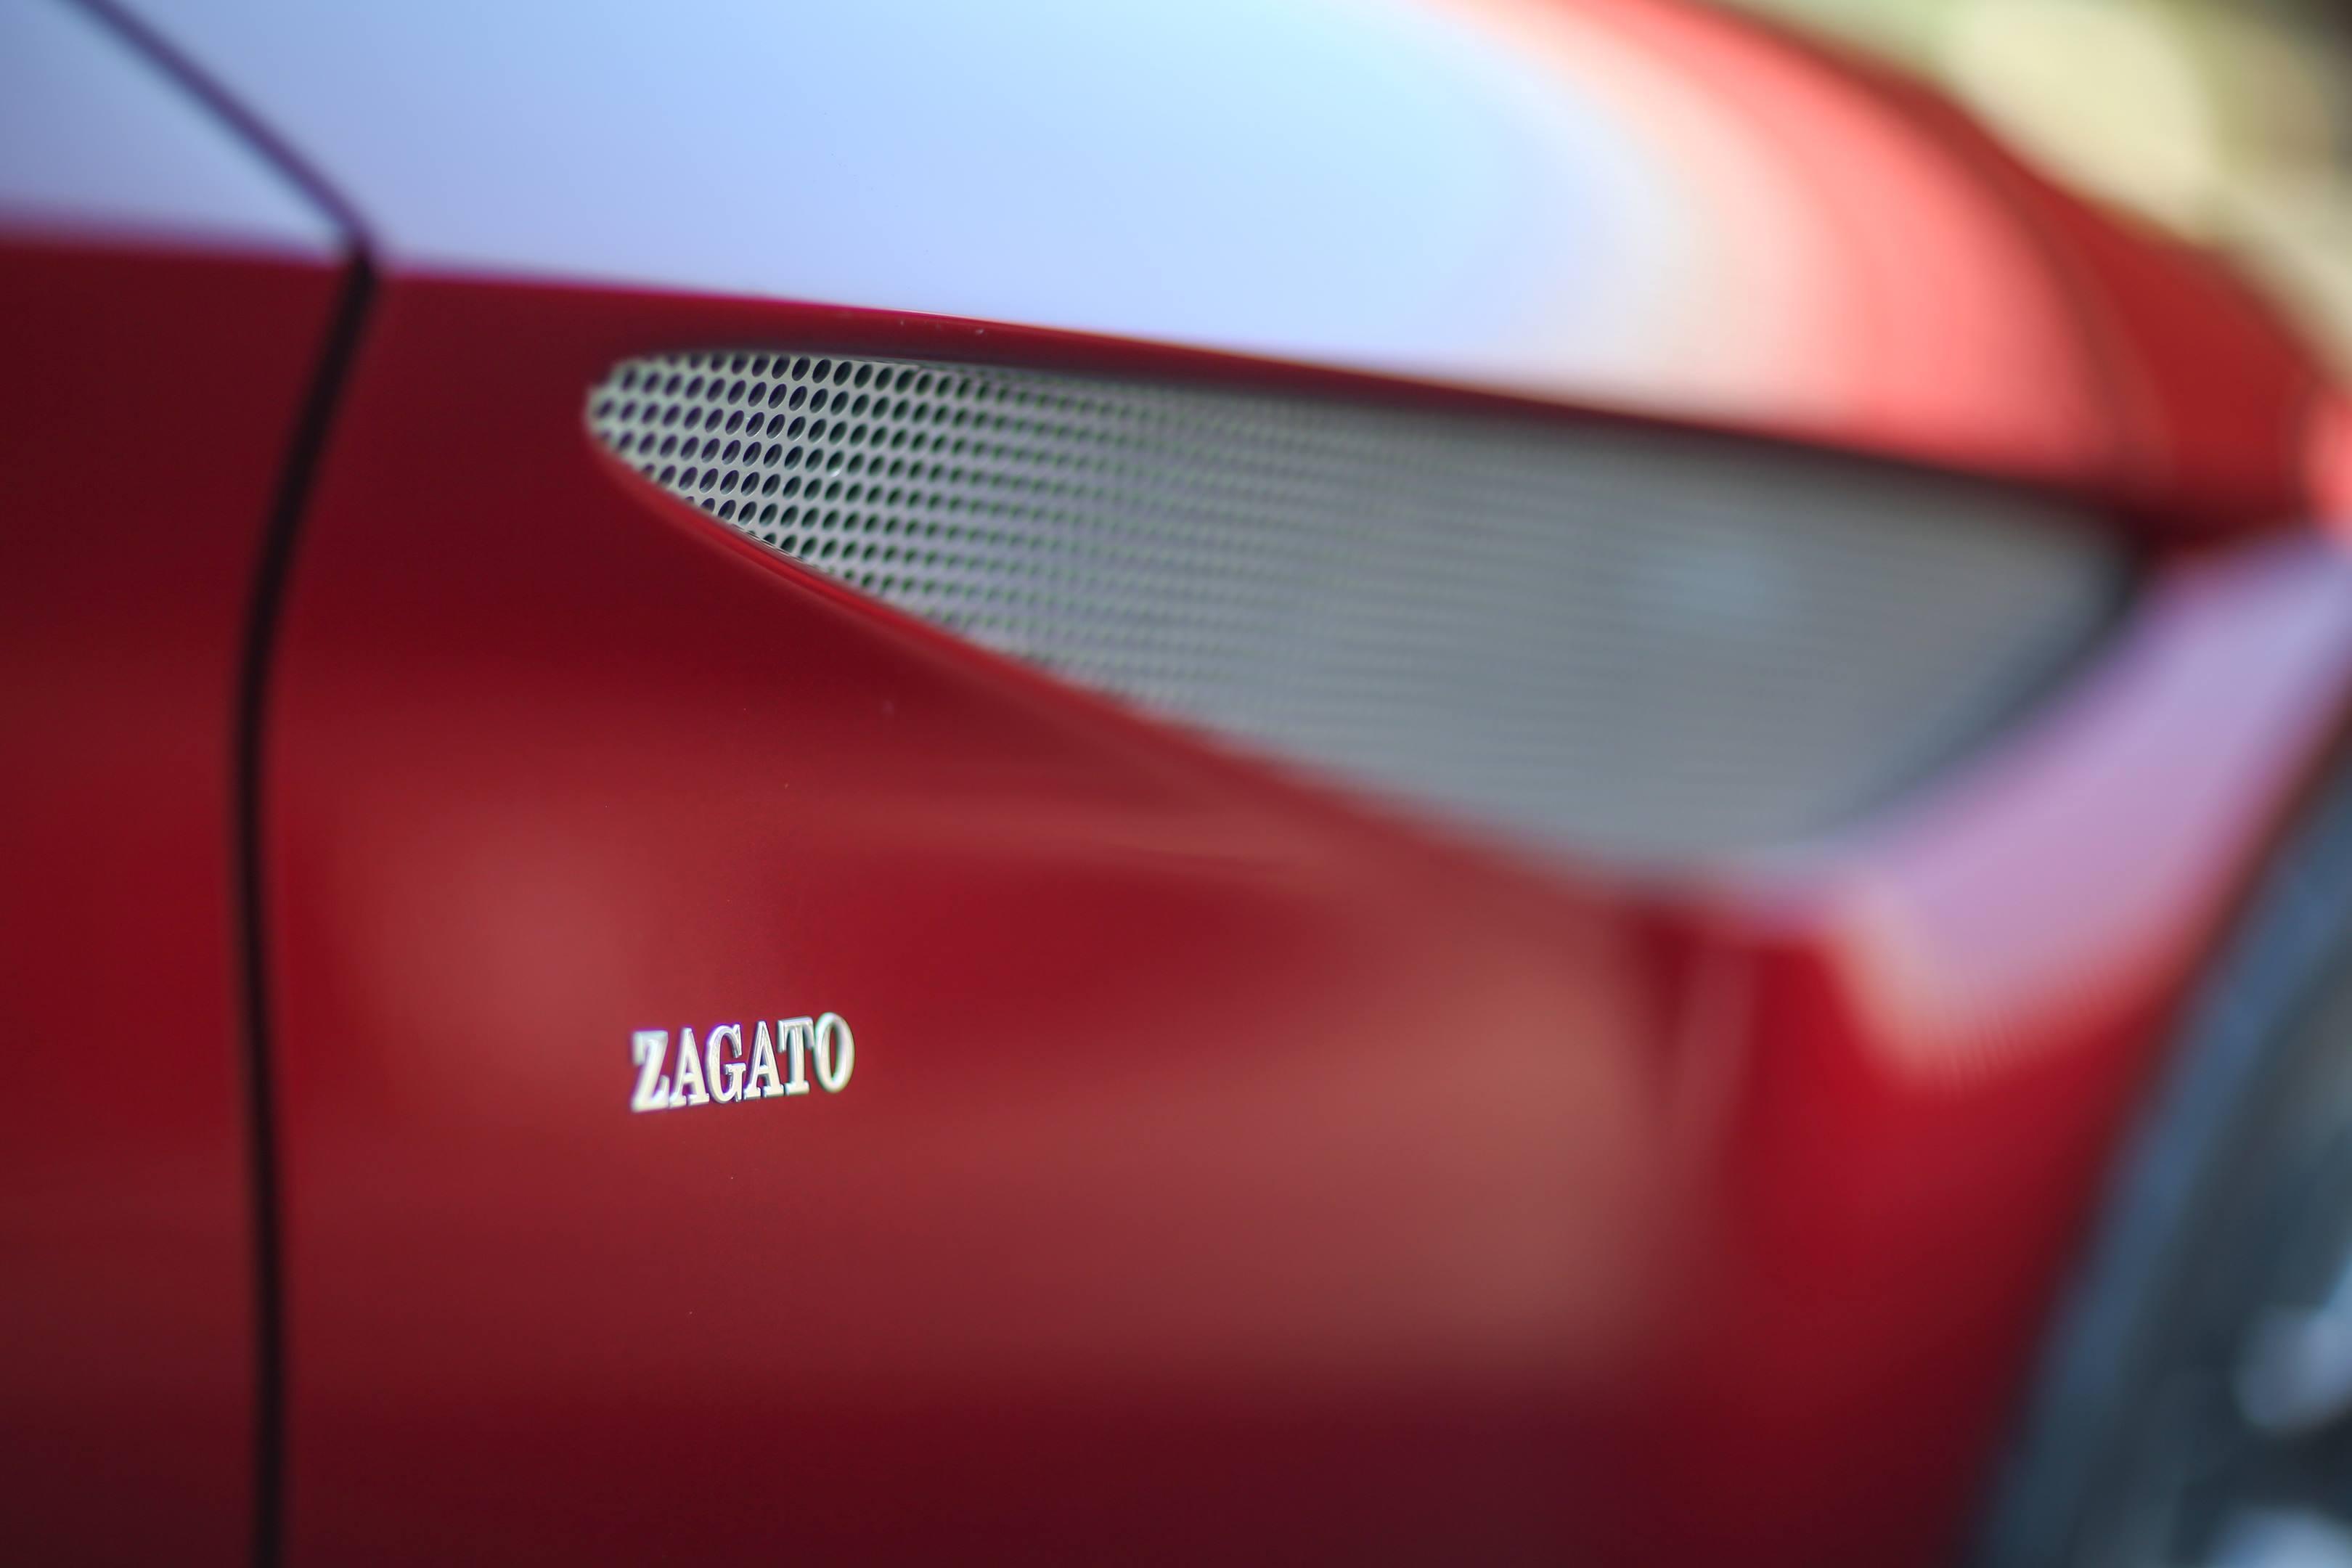 Zagato badge detail